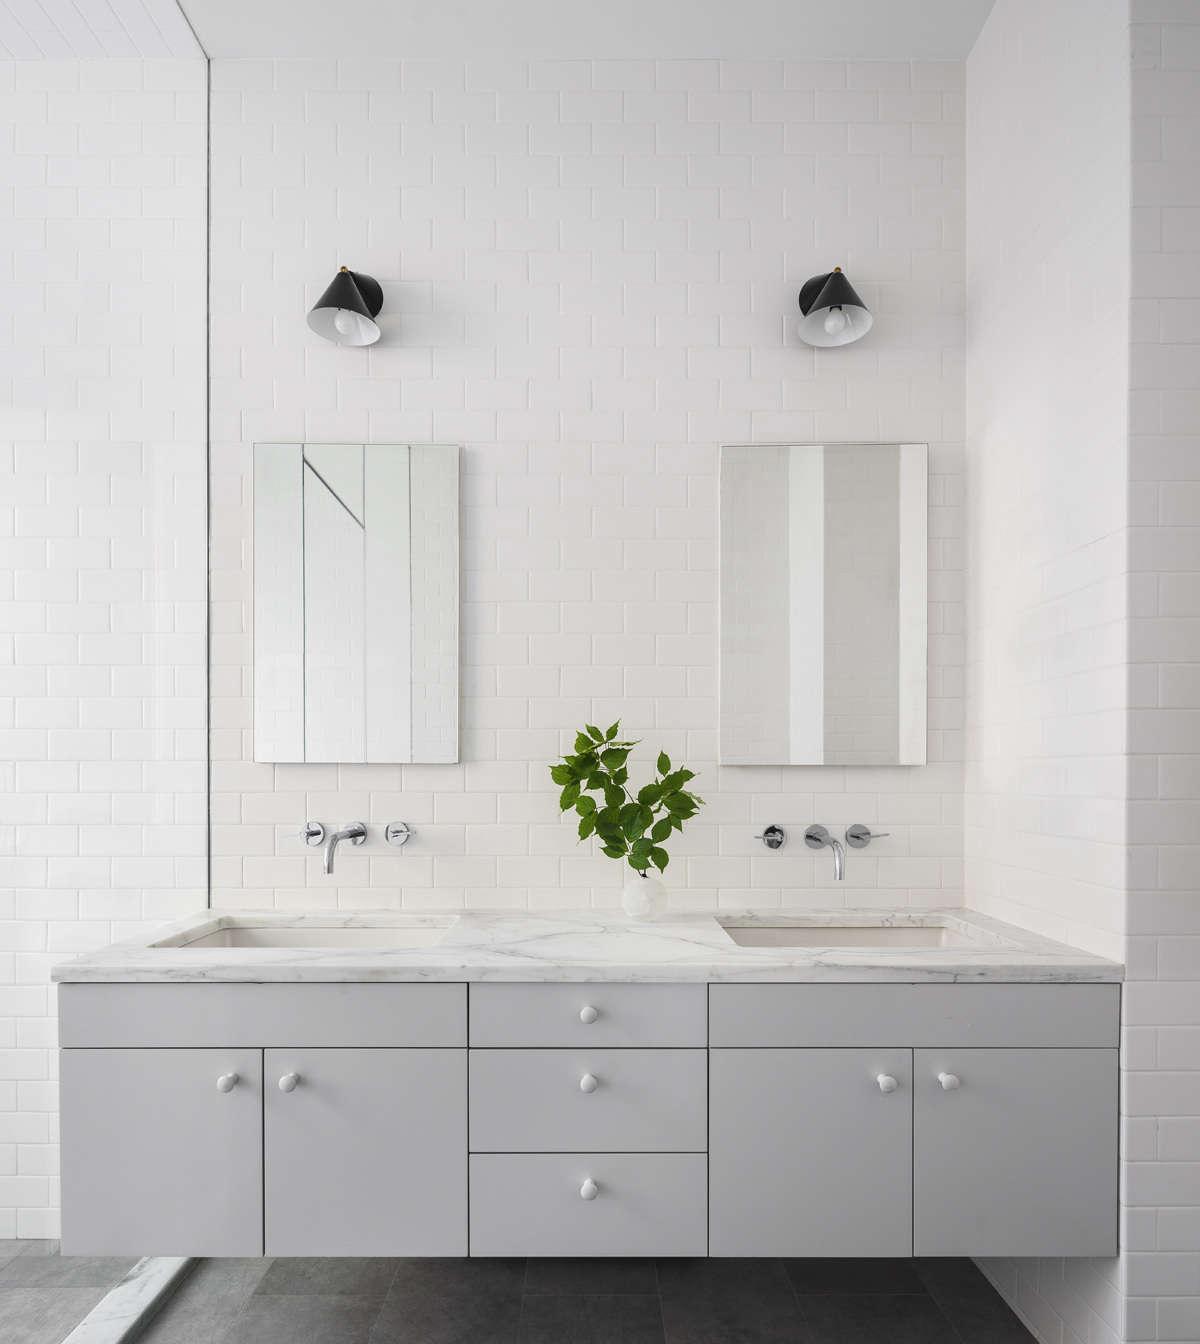 Steal This Look: A Serene Spa-Like Bathroom in Manhattan